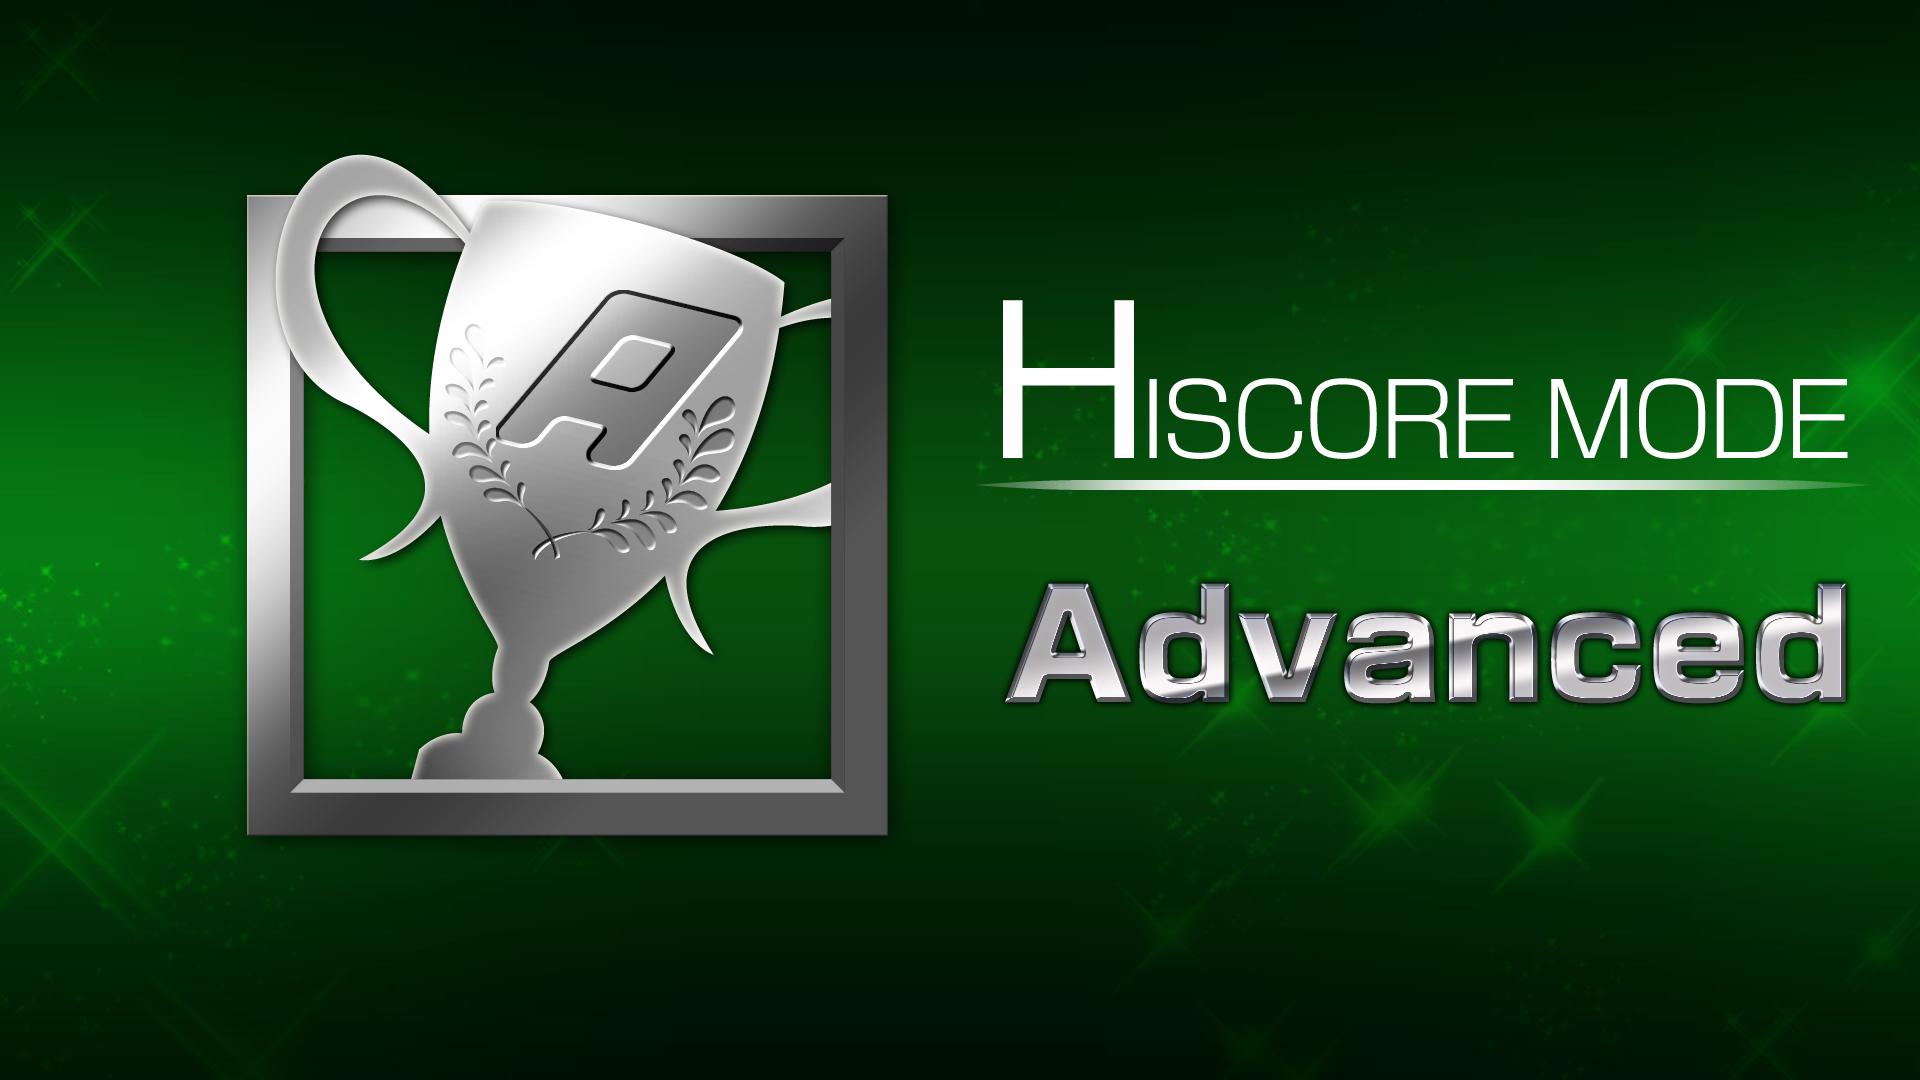 Icon for HI SCORE MODE 30,000 points